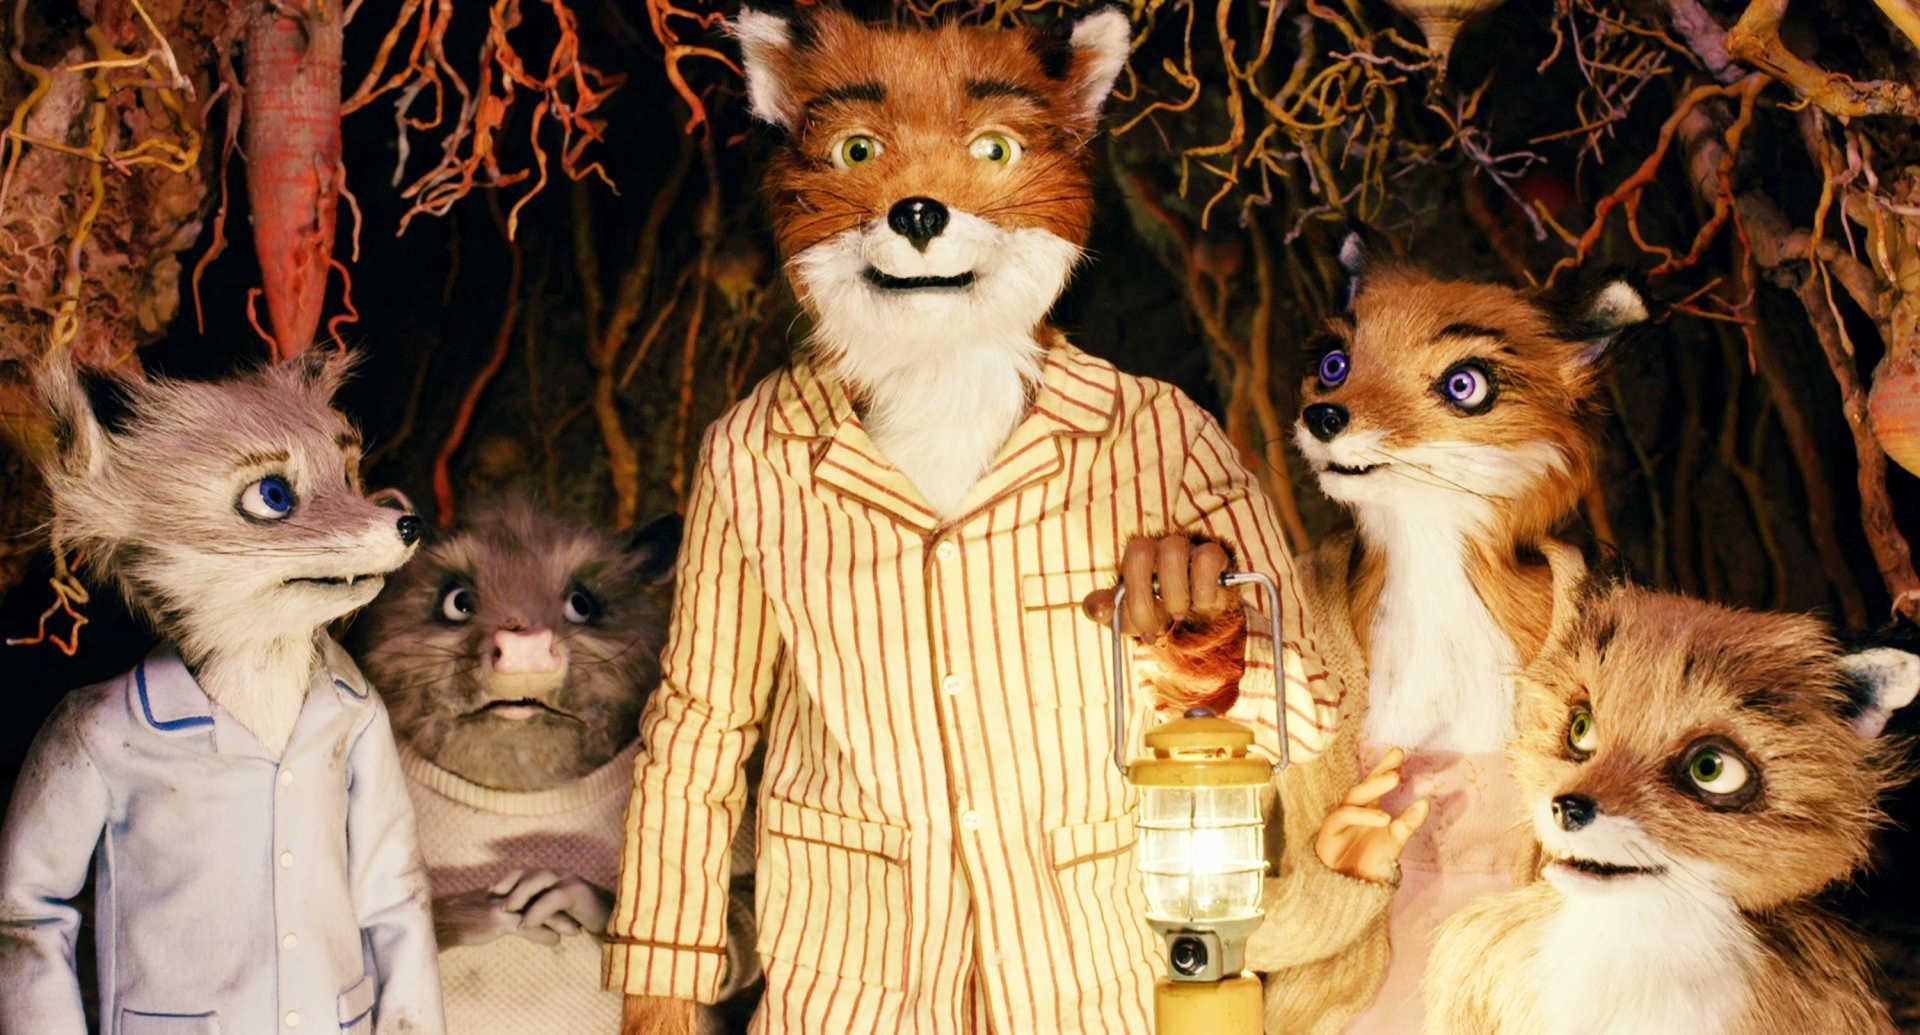 Fantastic Mr Fox Theme Song Movie Theme Songs Tv Soundtracks